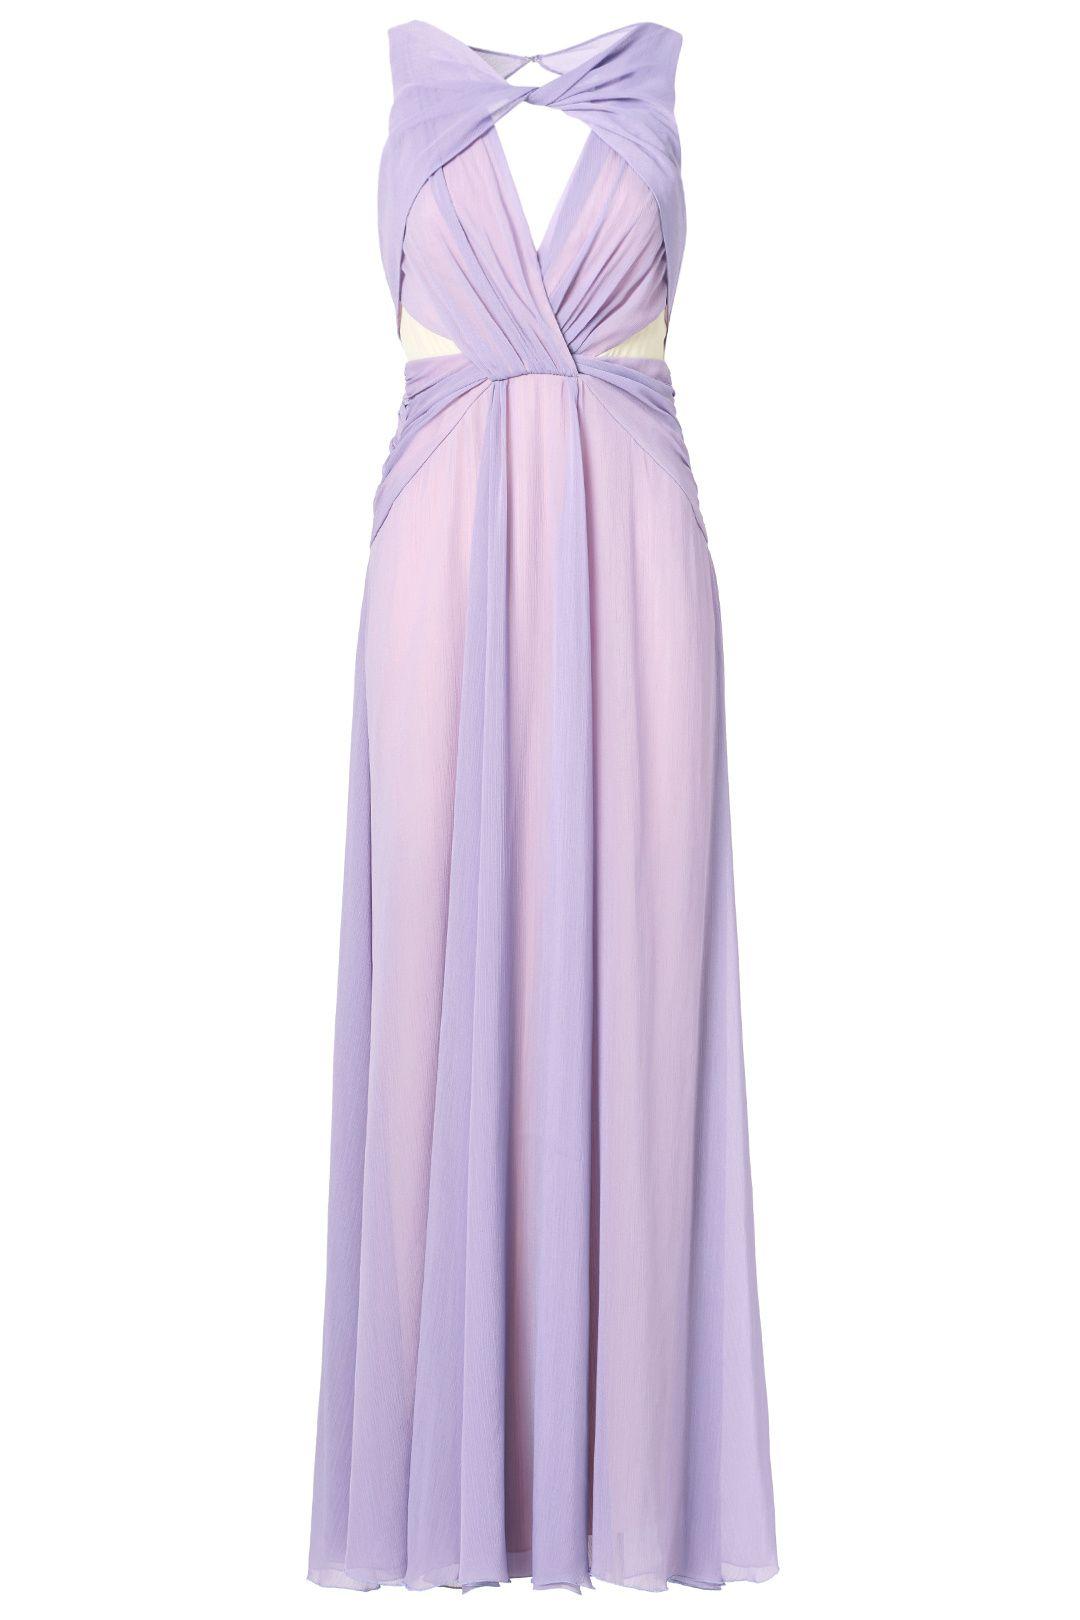 Pastel Petunia Gown | Pinterest | Petunias, Badgley mischka and Pastels